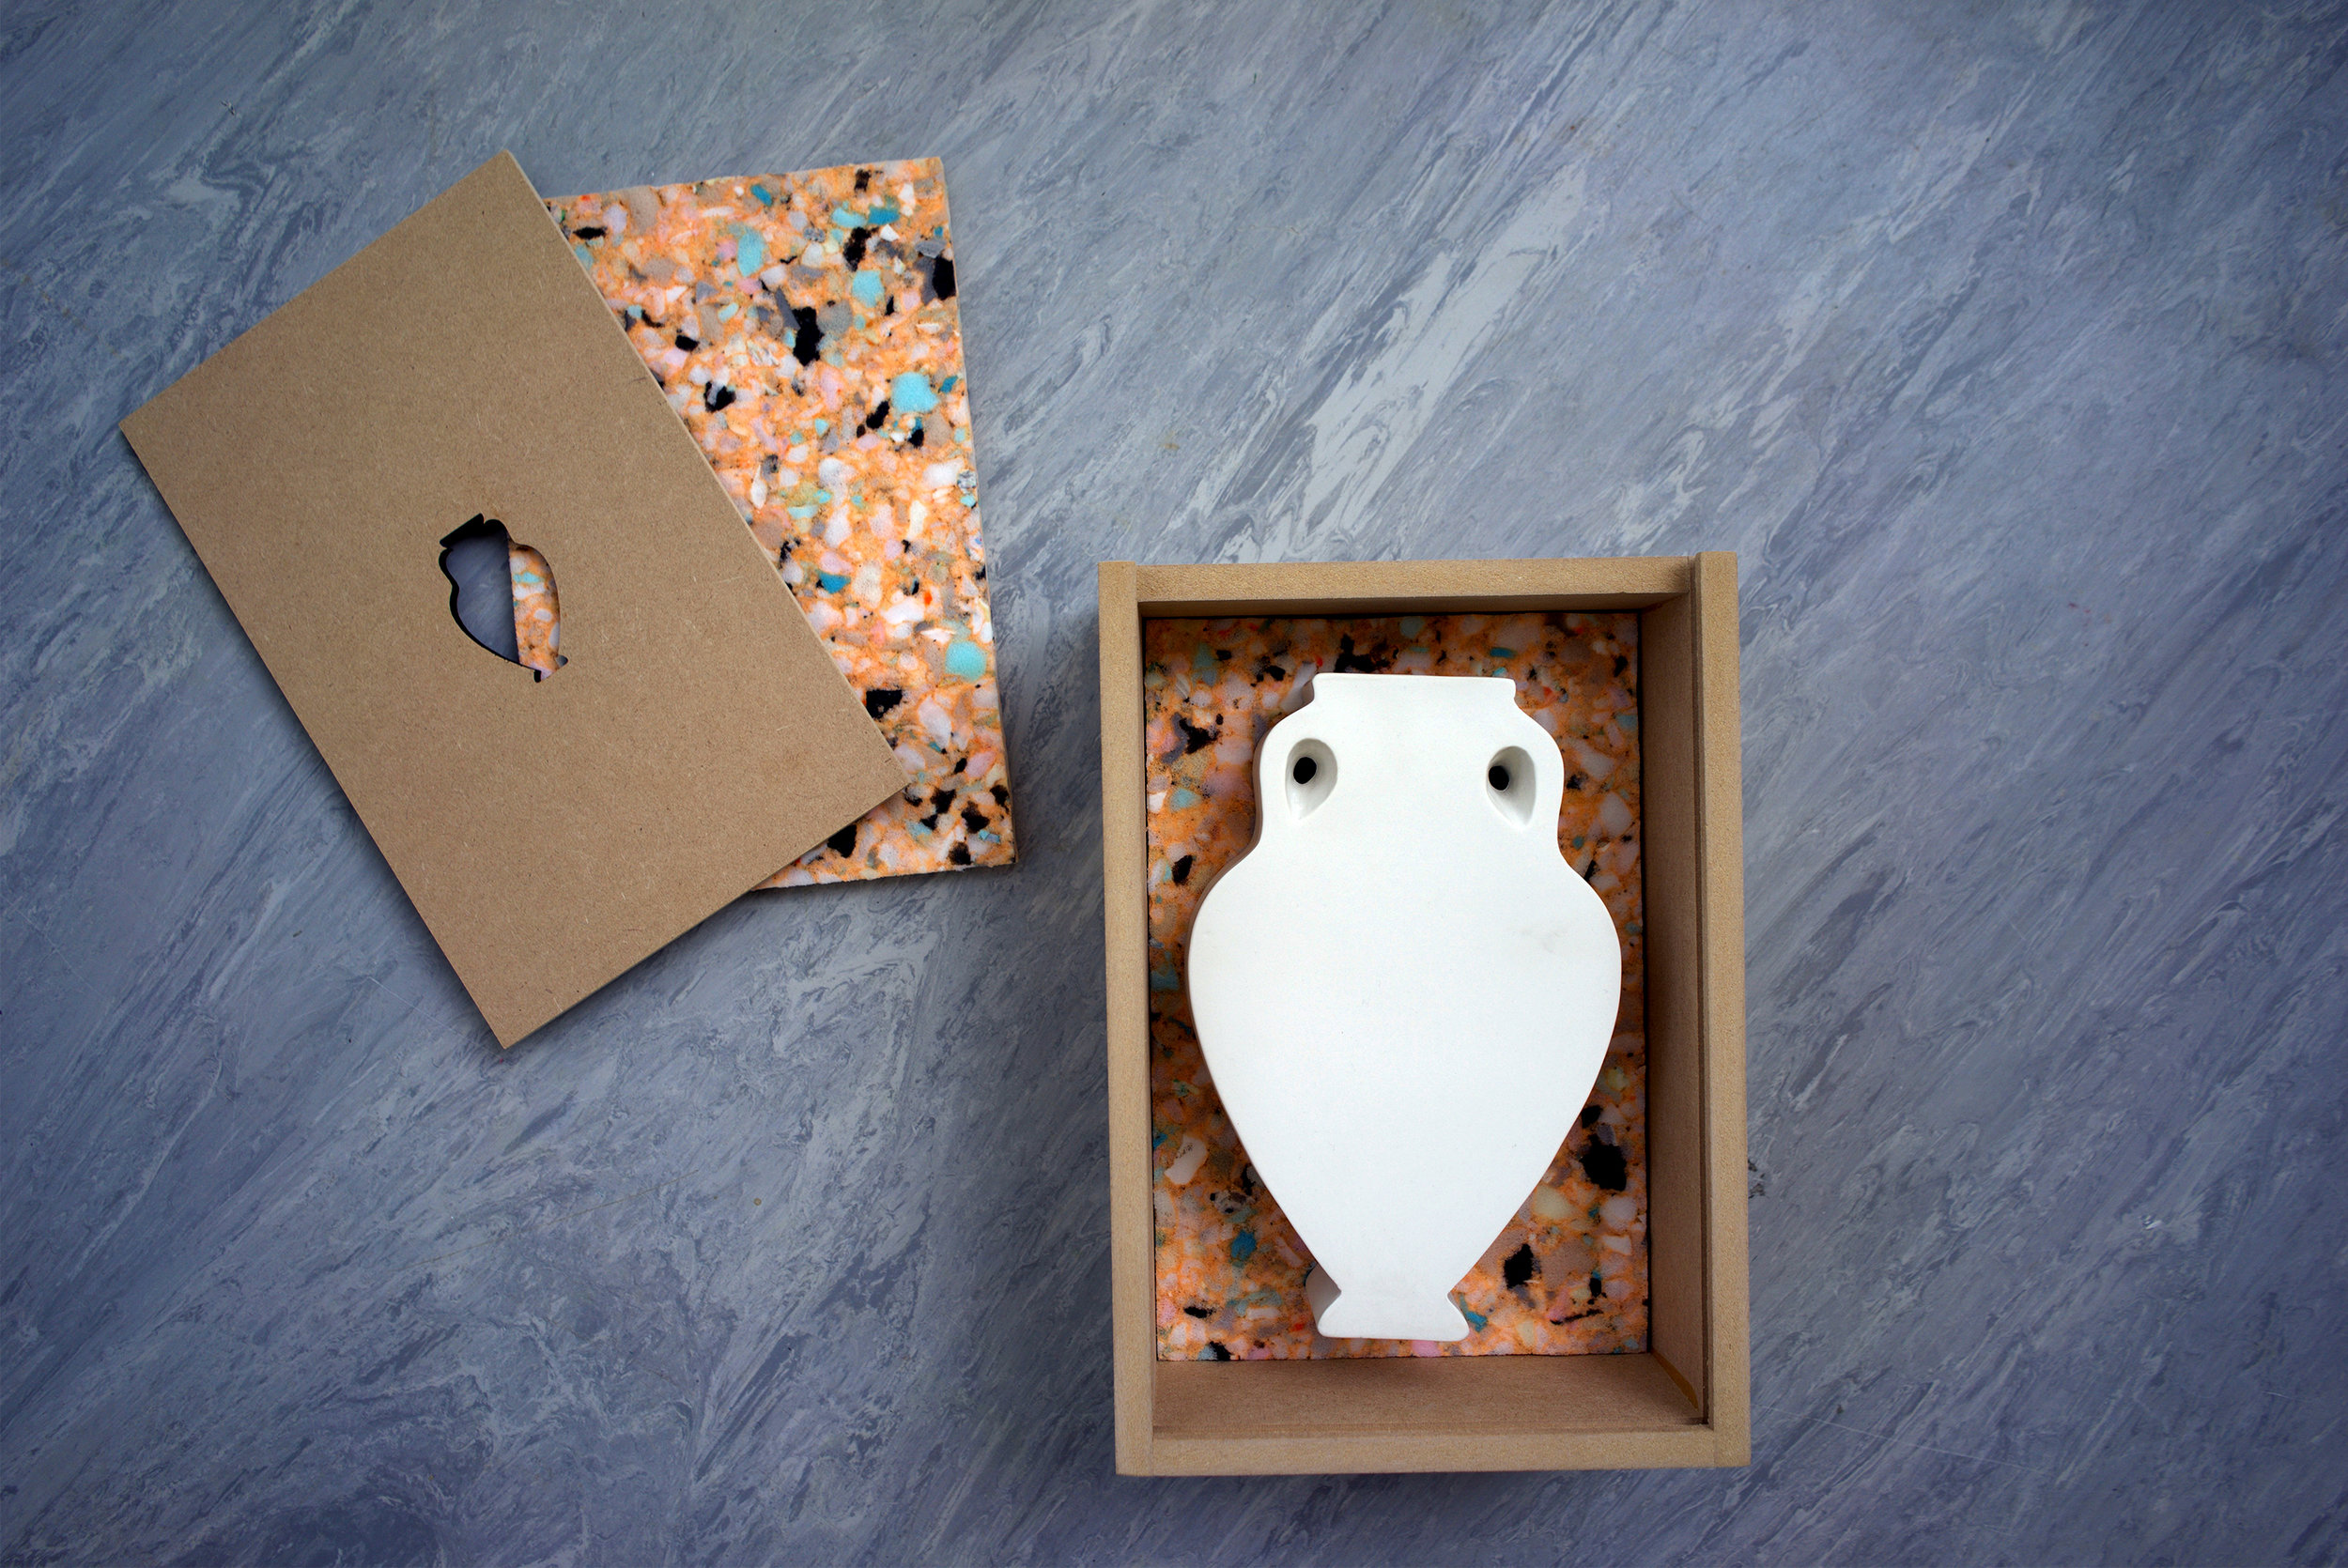 amphora1.jpg